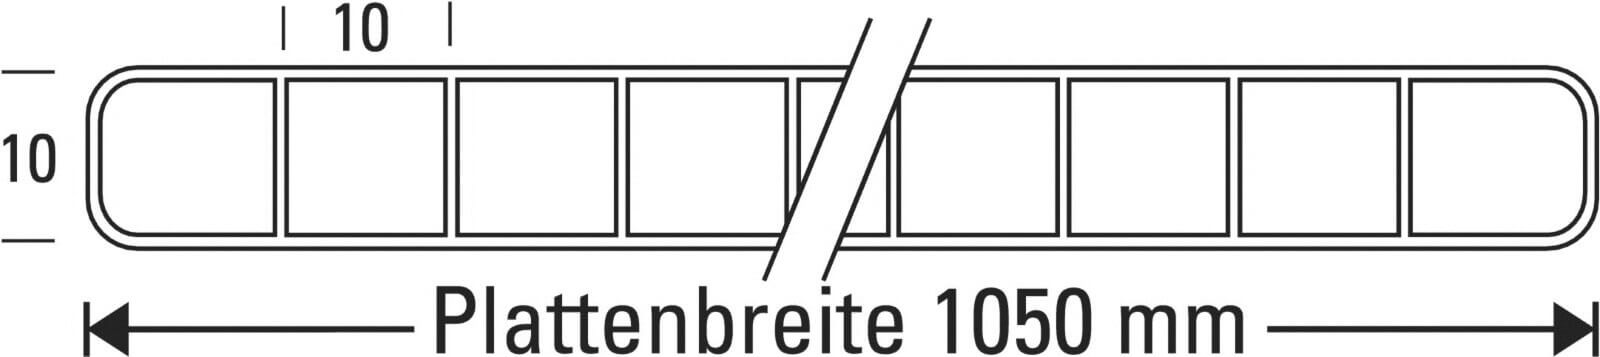 Hervorragend Polycarbonat Stegplatte | 10 mm Breite 1050 mm | Glasklar FG95